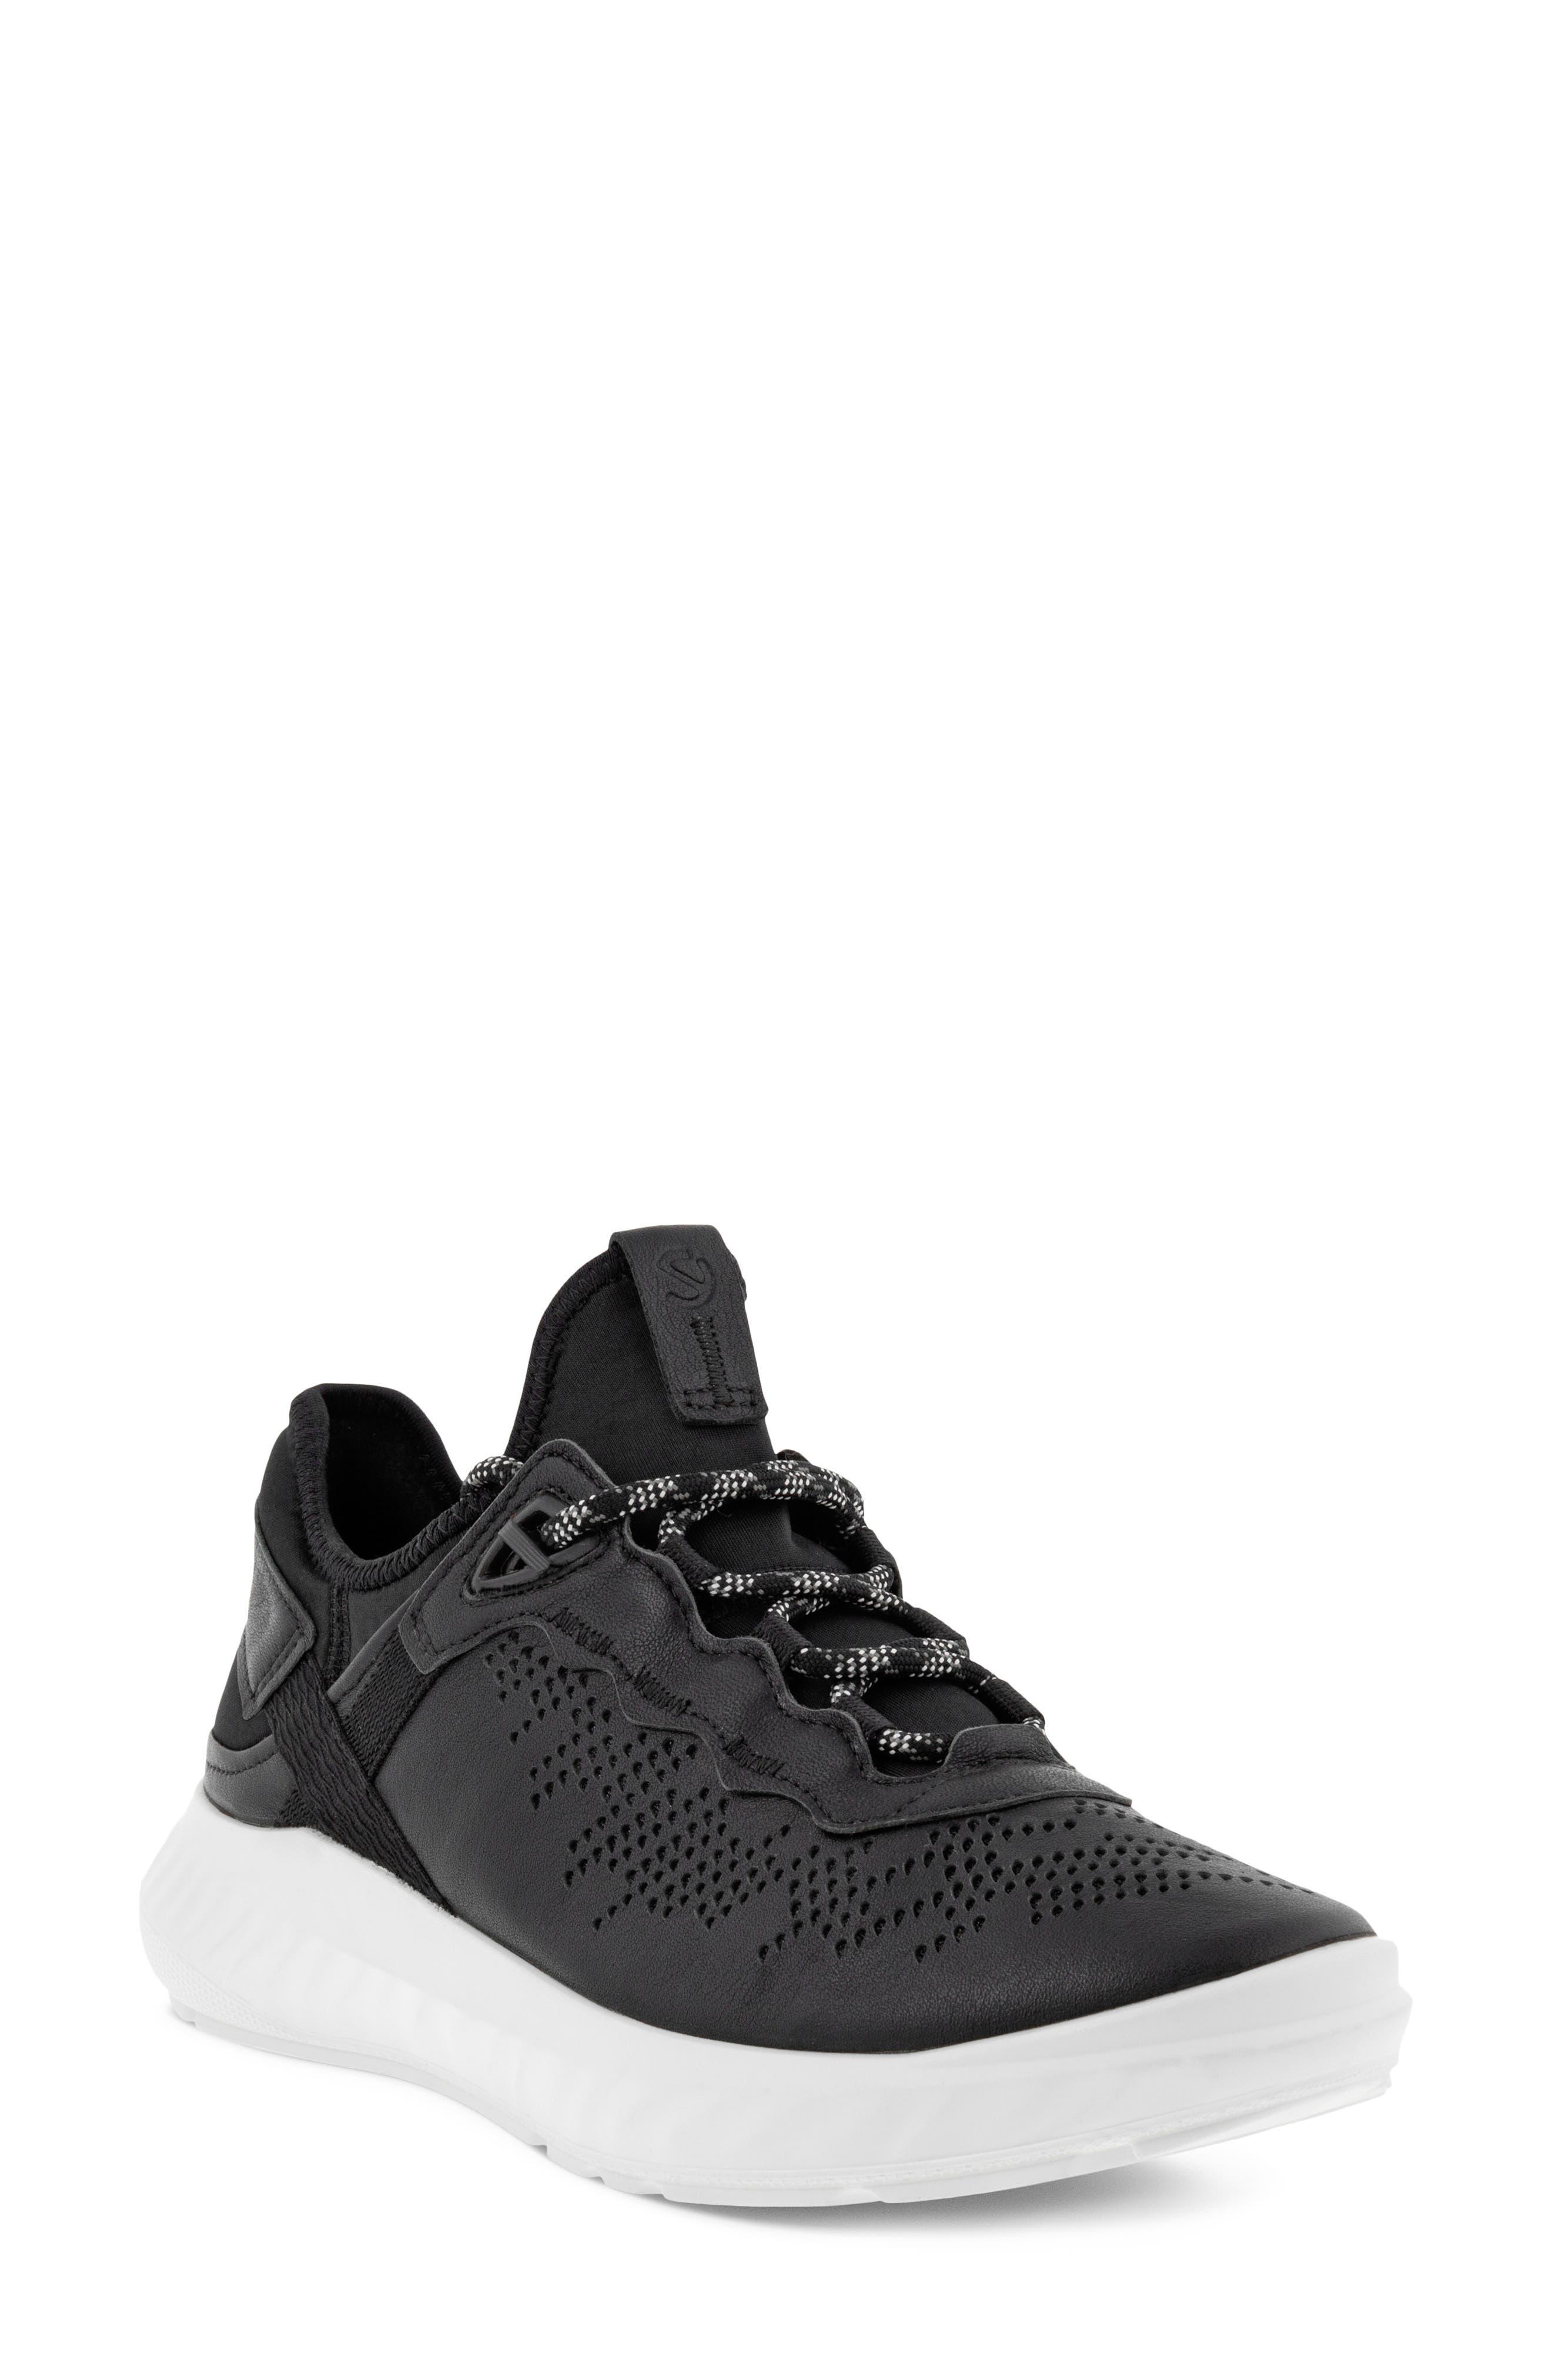 Women's Ecco Ath-1Fw Sneaker